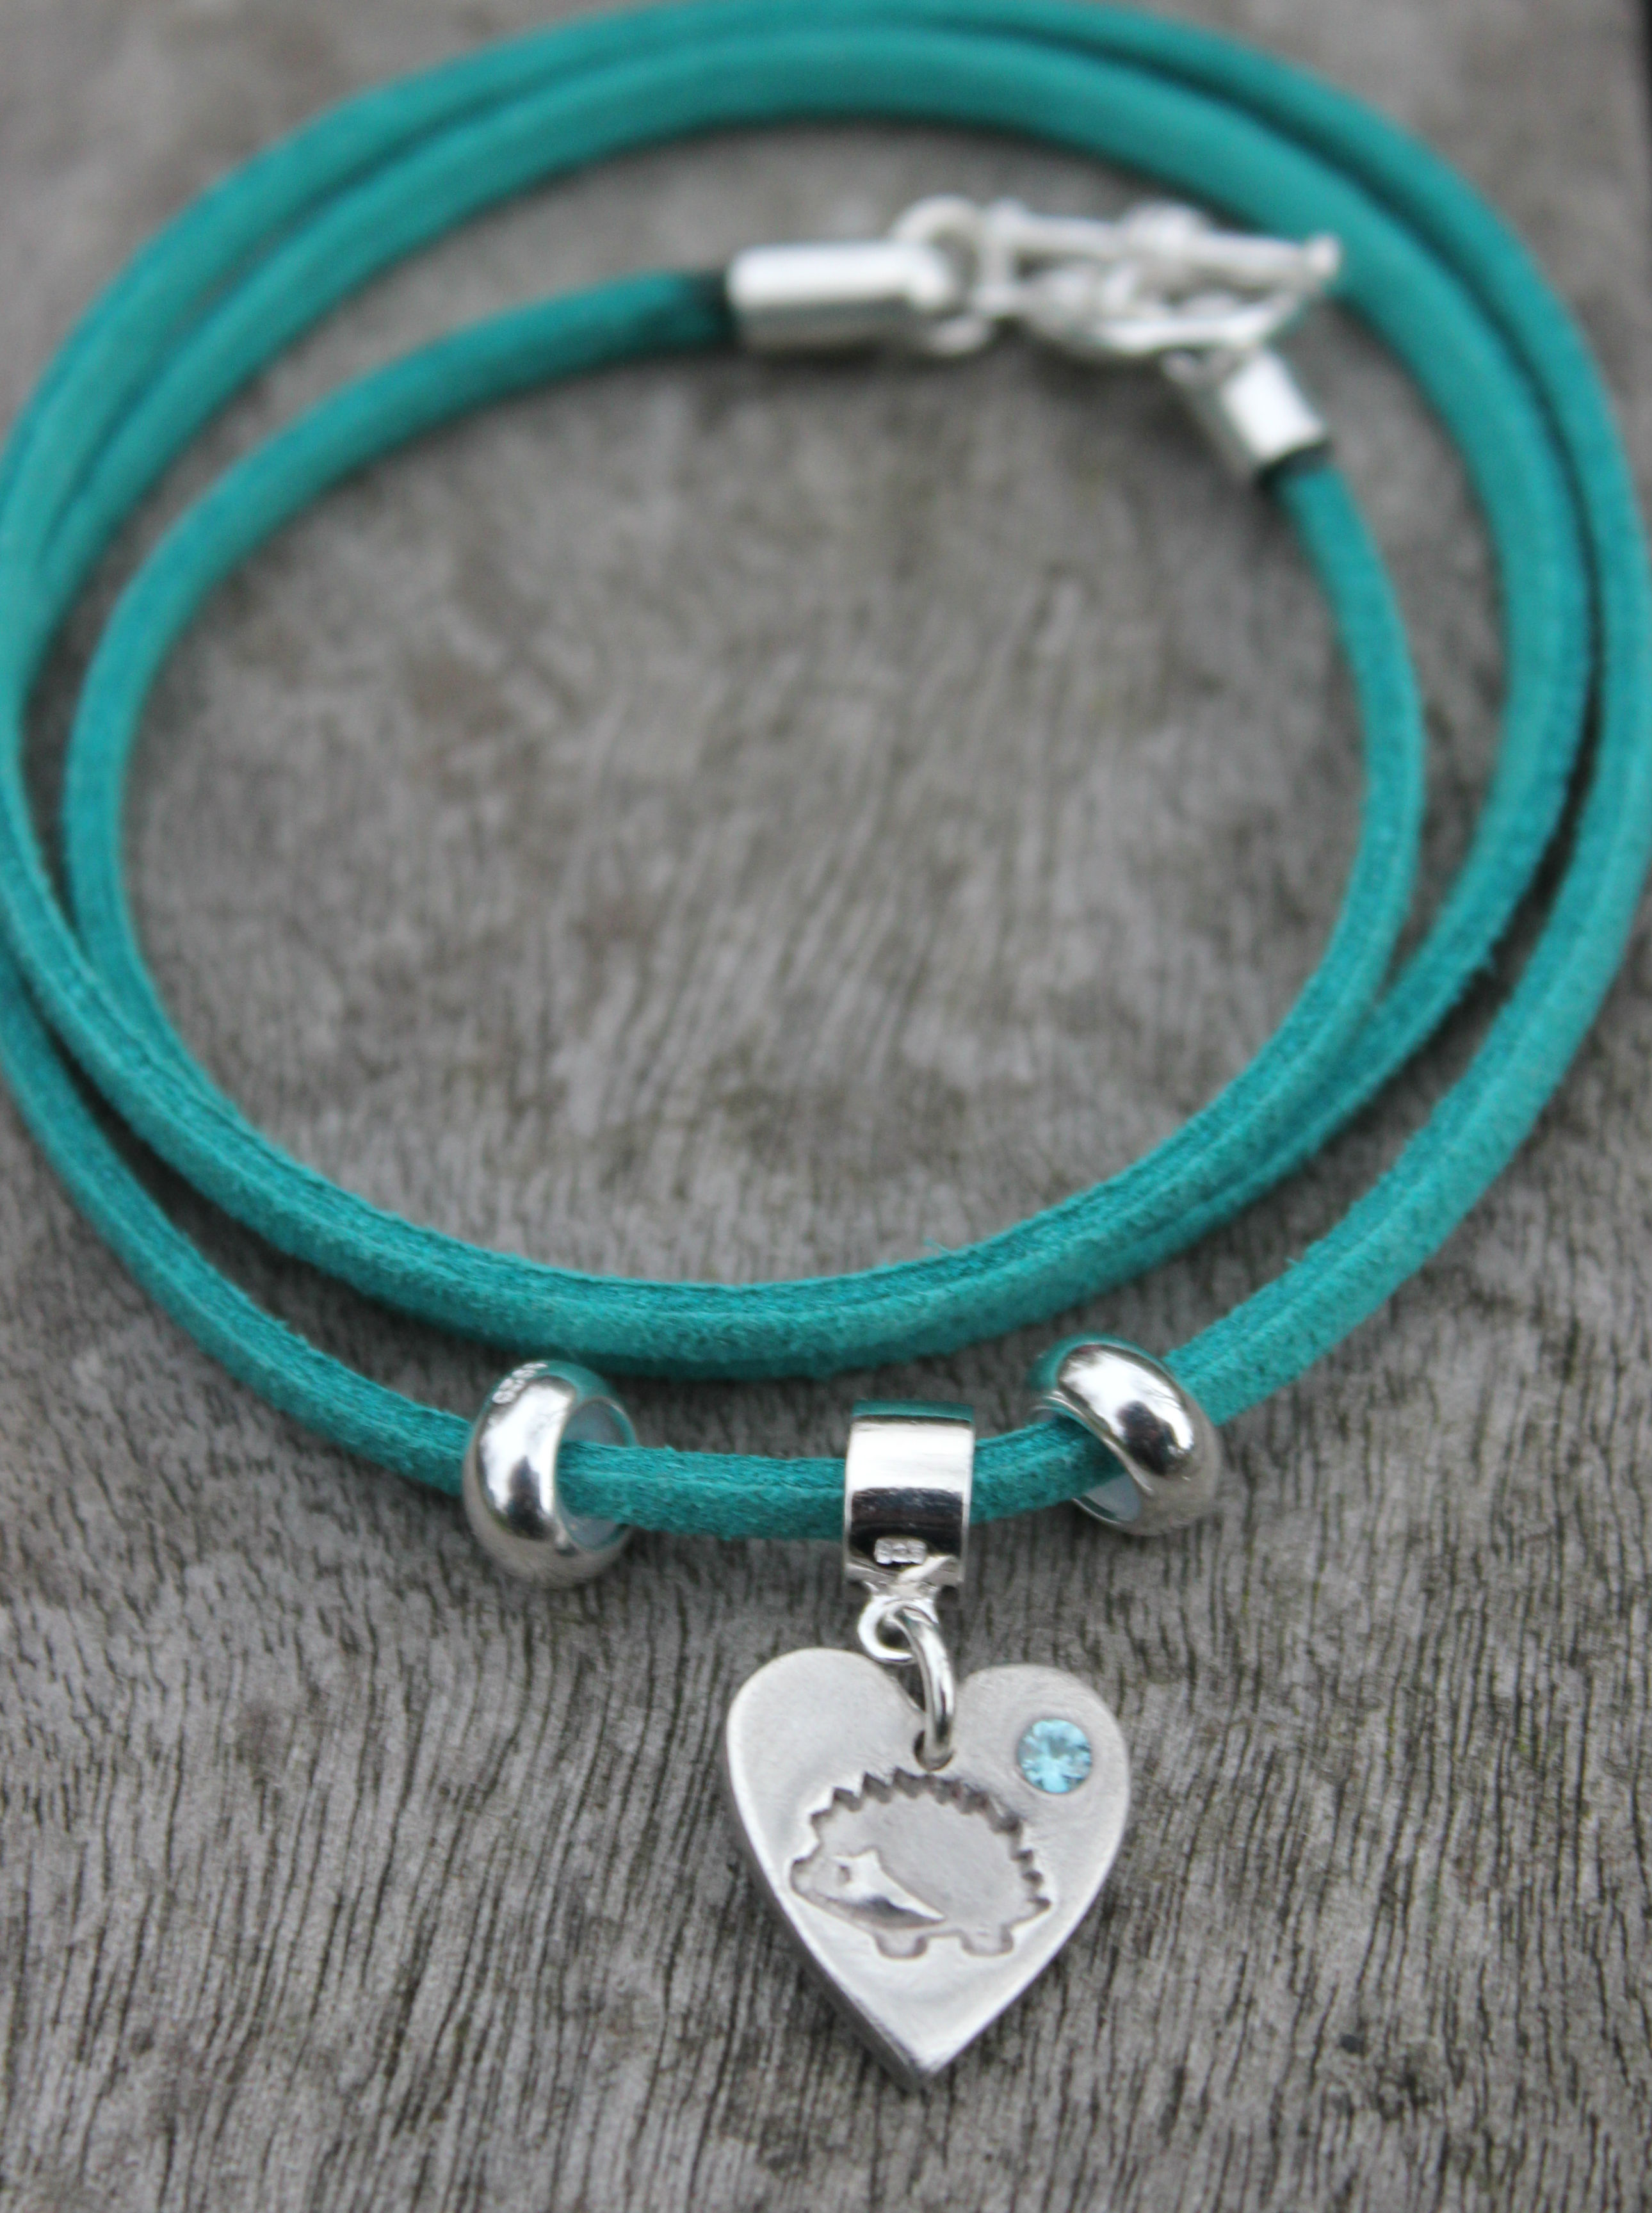 teal hedgehog bracelet with hedgehog charm with blue zircon